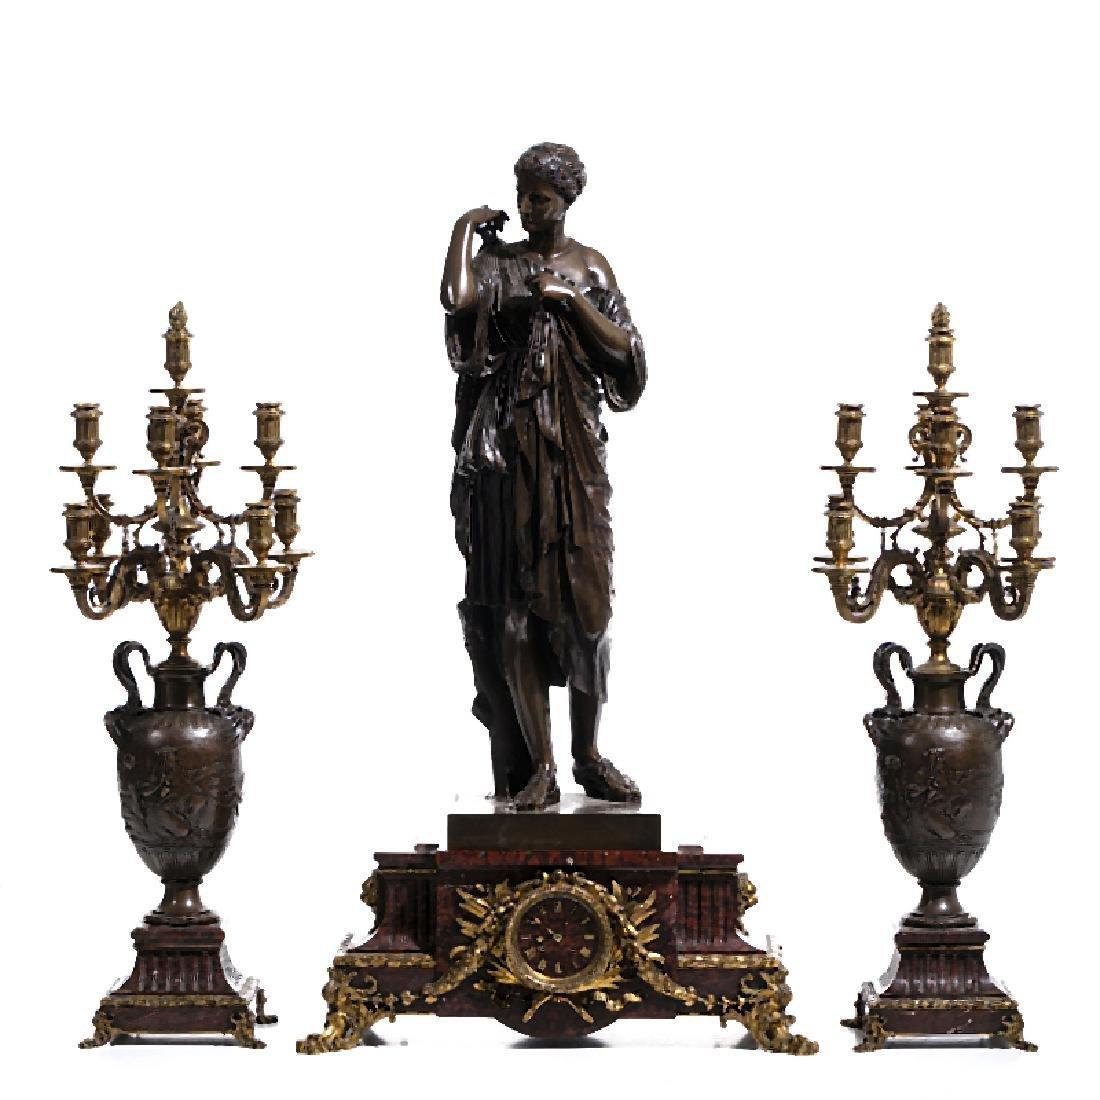 FERDINAND BARBEDIENNE (1810-1892) - Large bronze table